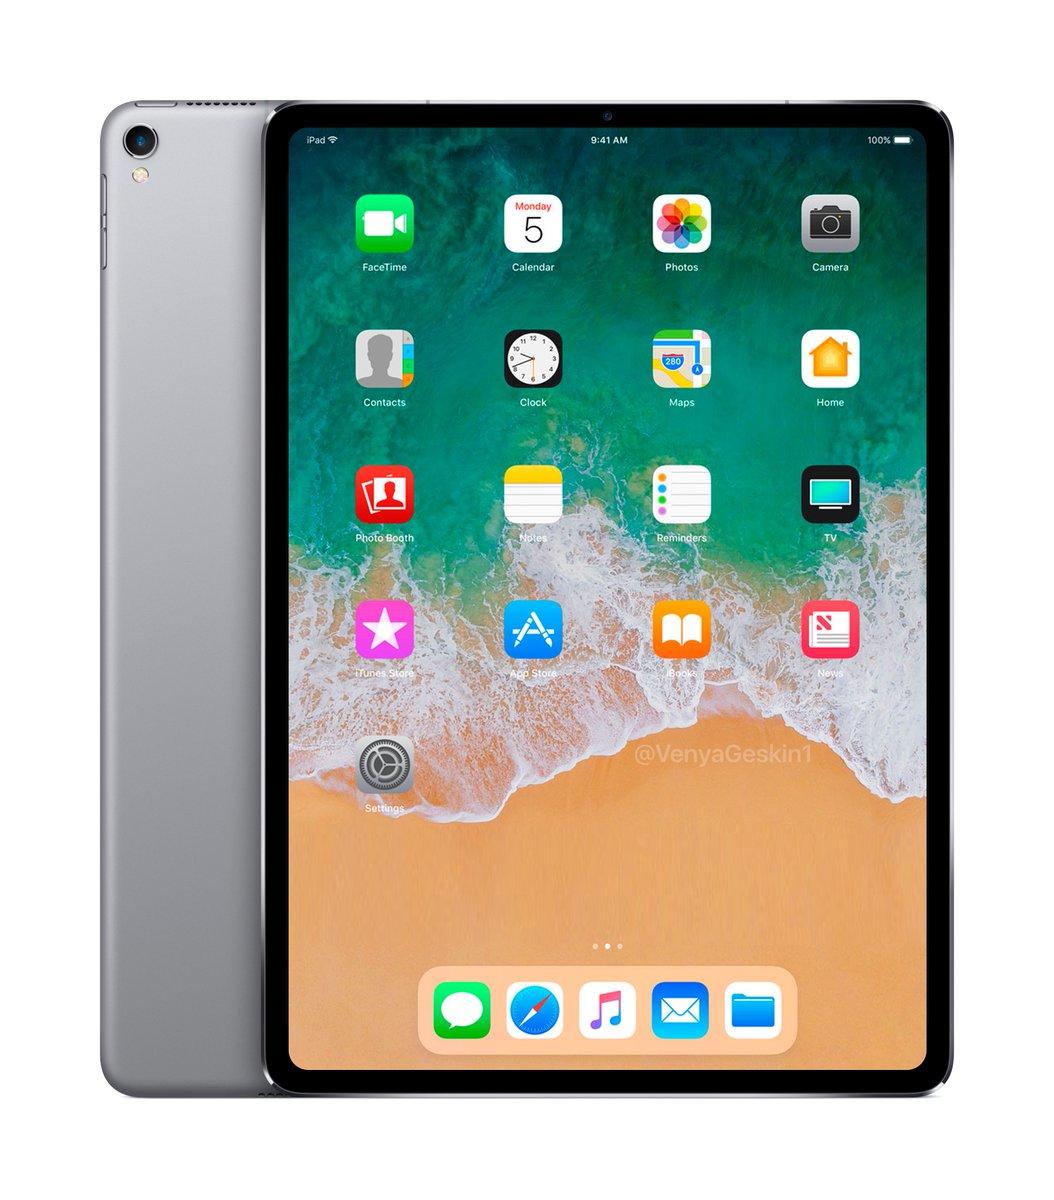 2018 iPad Pro render 2